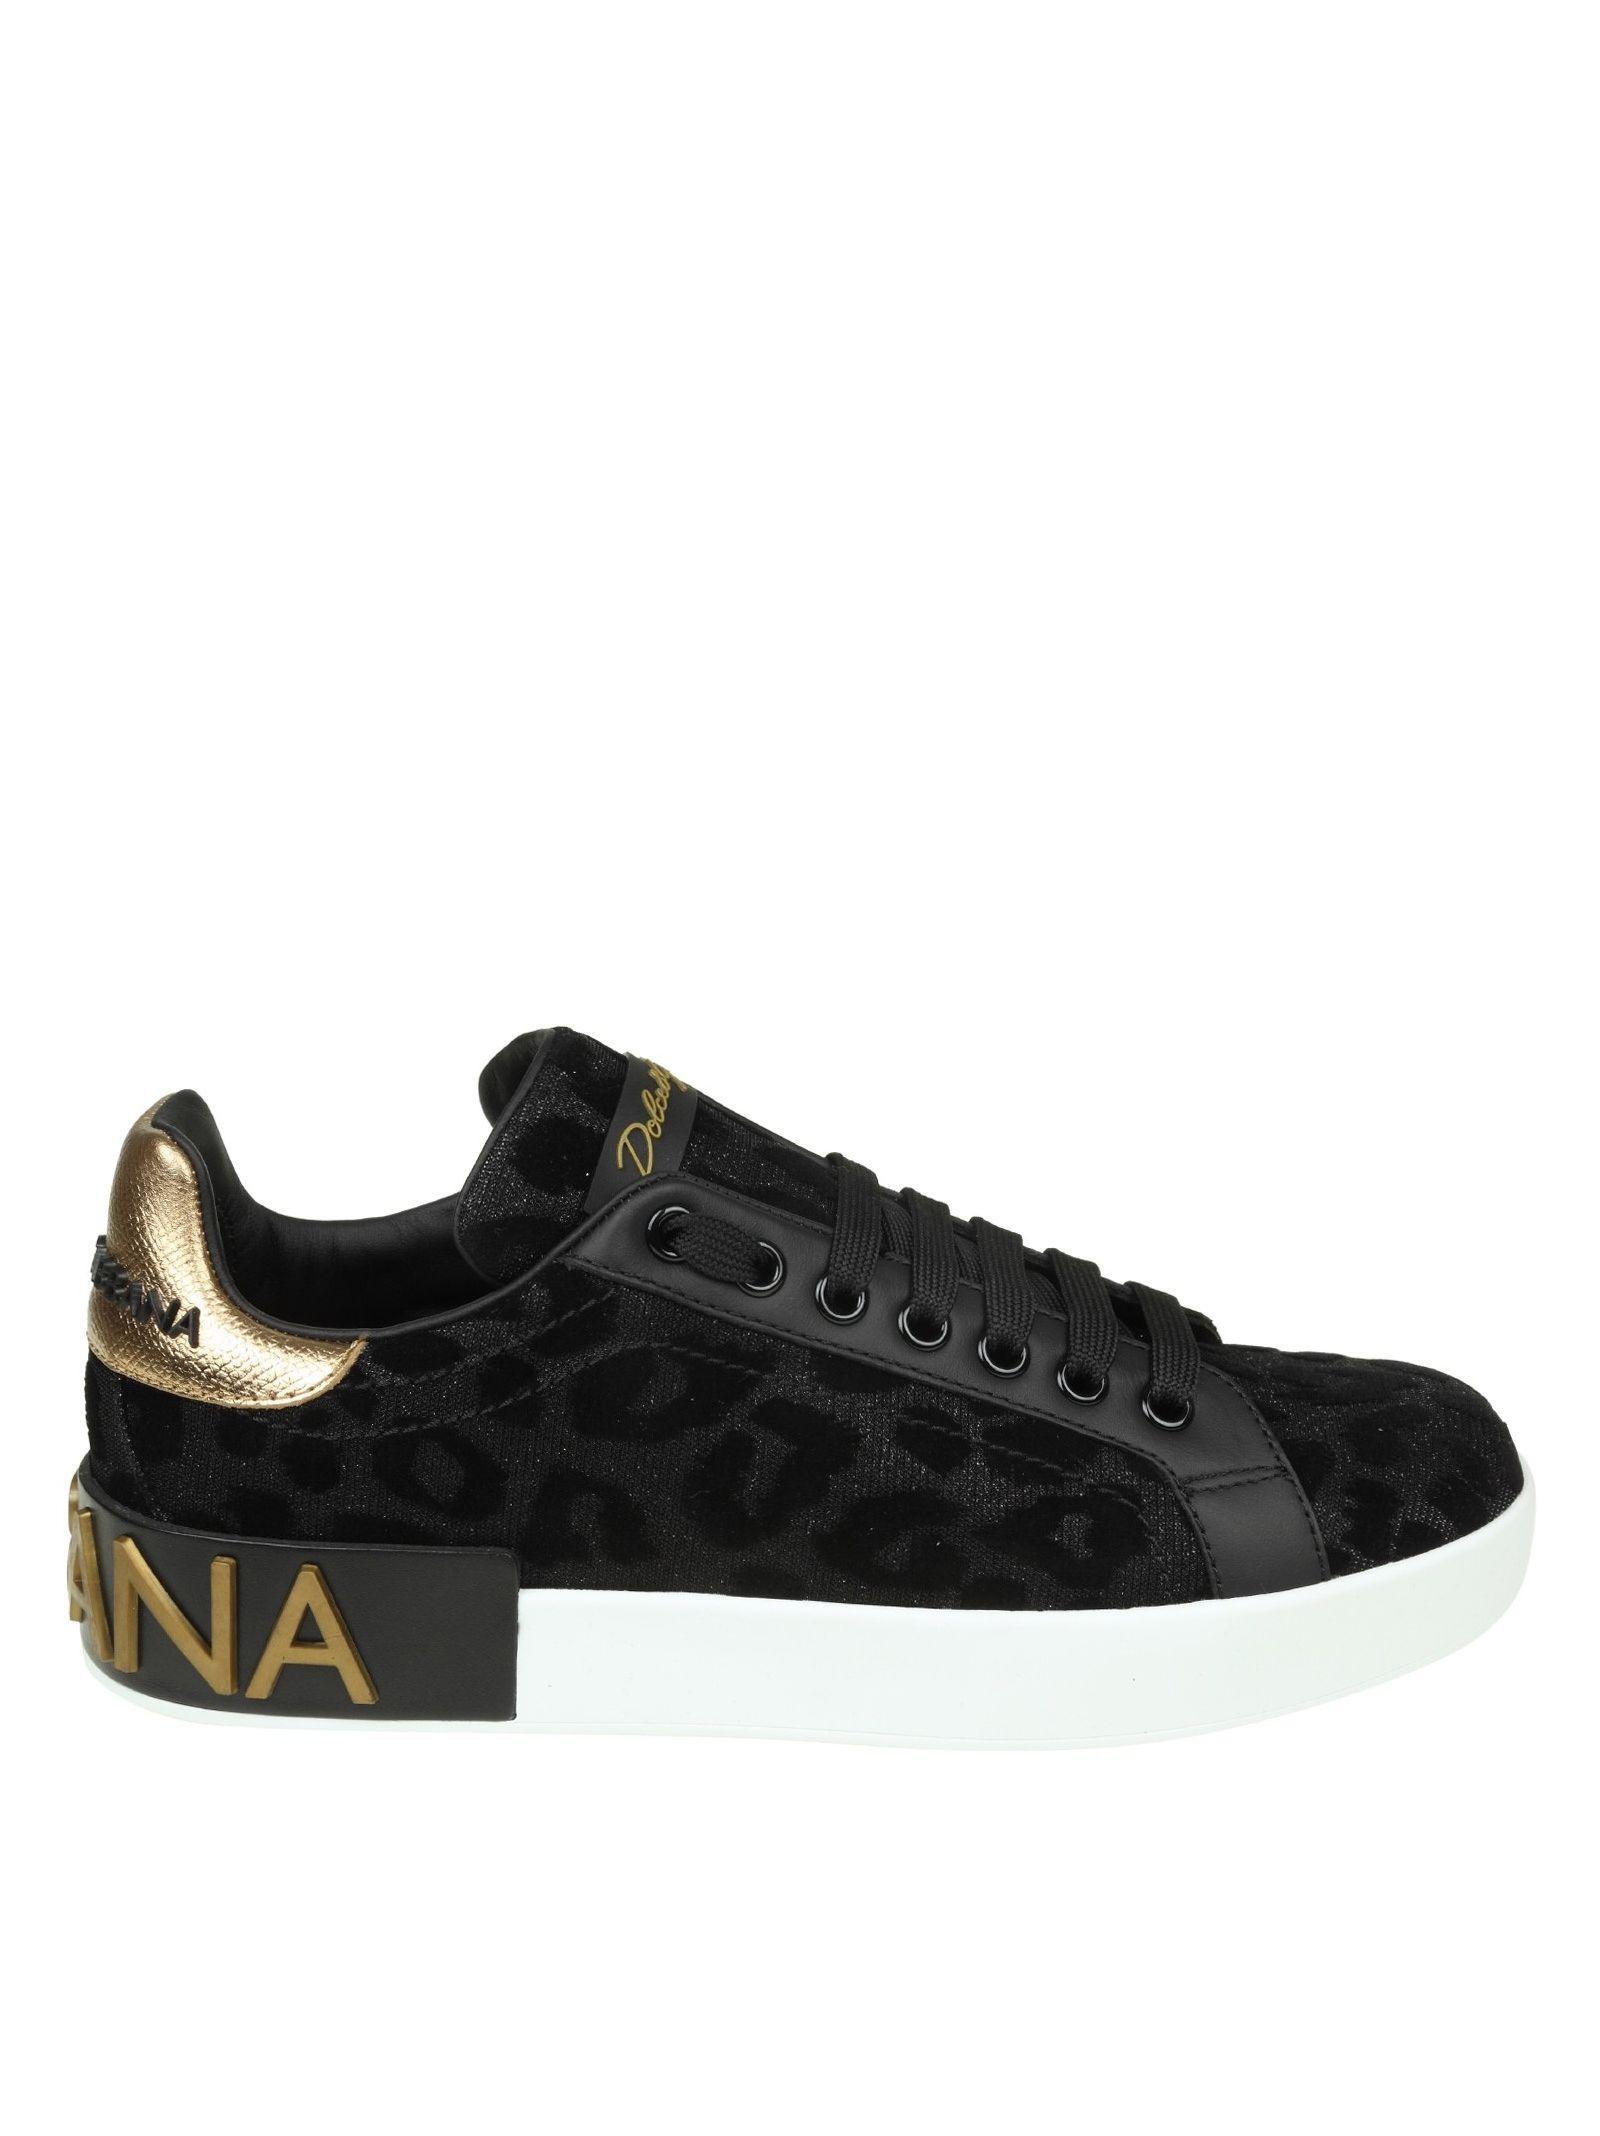 Dolce & Gabbana Portofino Sneakers In Fabric Lurex Effect Black With Velvet Print